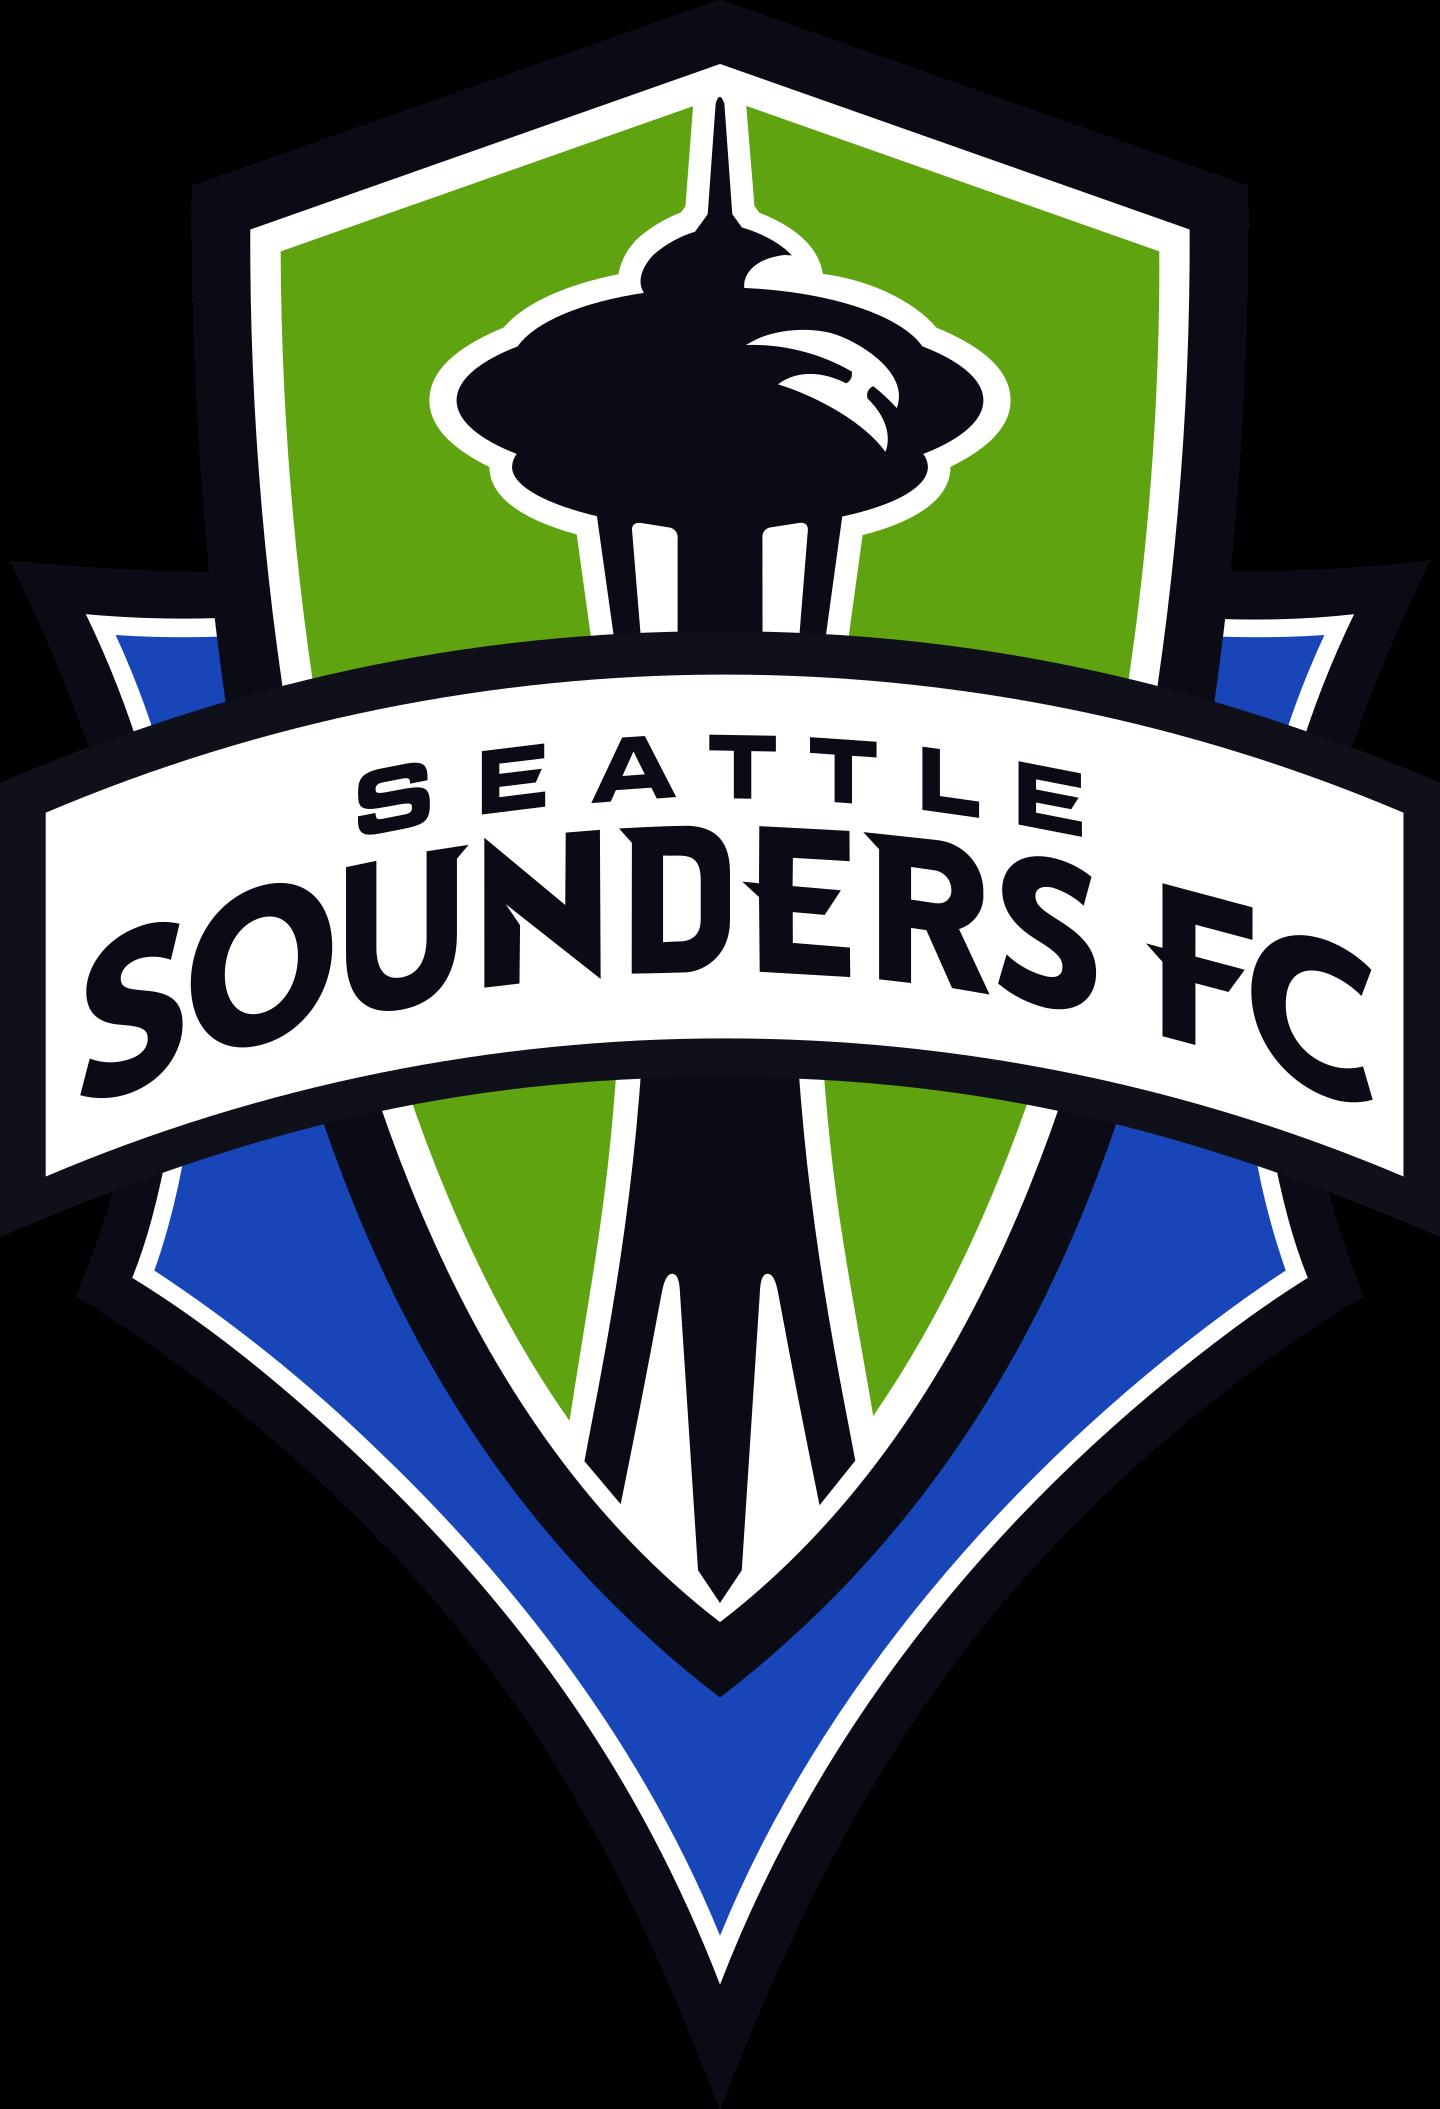 seattle sounders fc logo 2 - Seattle Sounders FC Logo